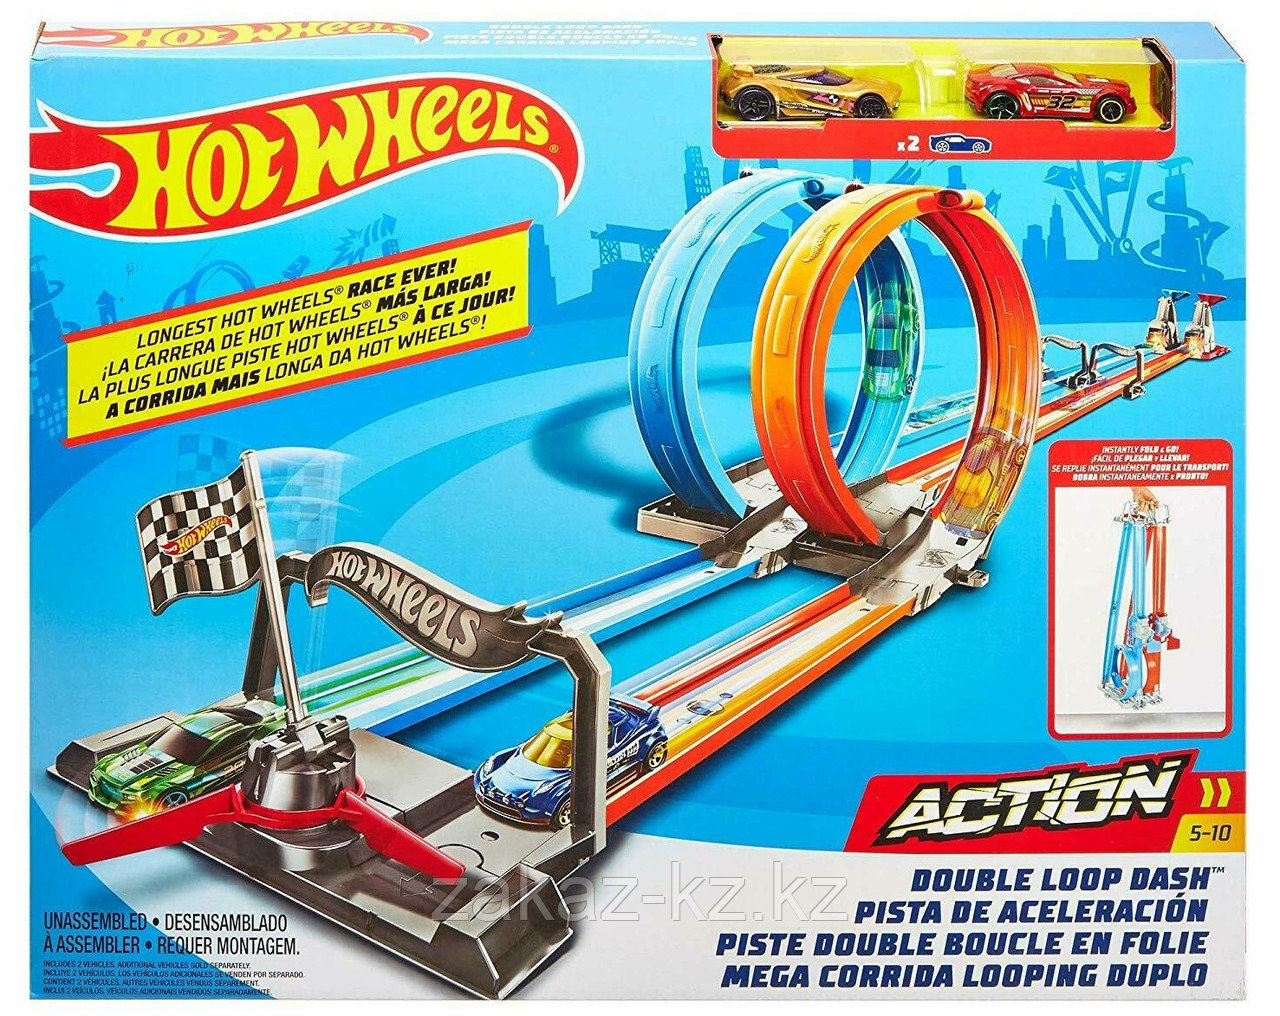 Хот Вилс, Скоростные мертвые петли Hot Wheels - фото 1